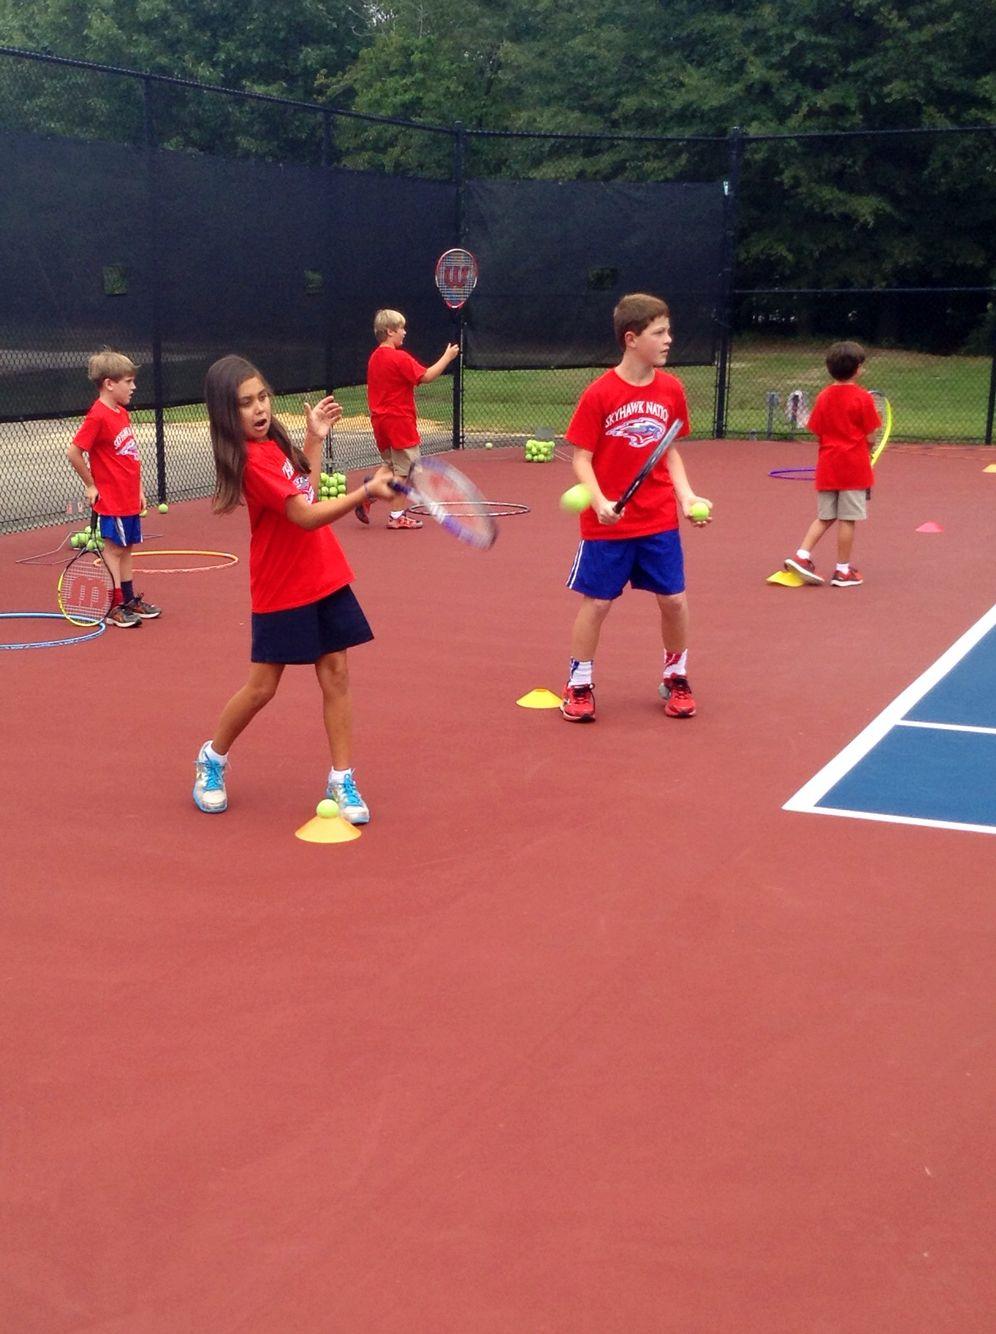 Fun with Tennis PLUS Program September 26, 2014 tennis